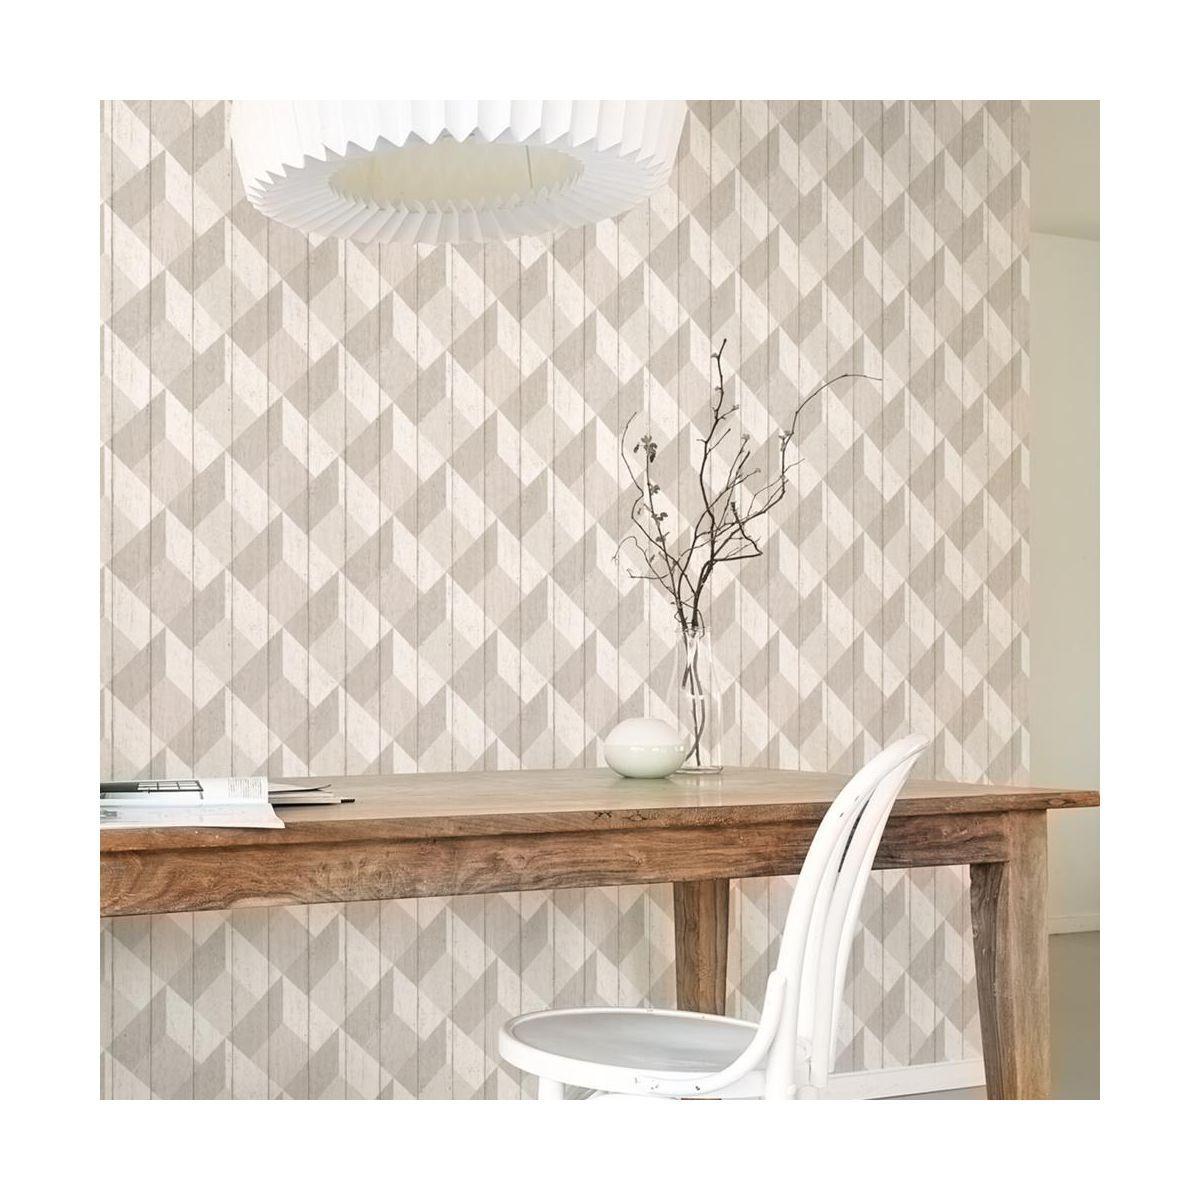 Tapeta Unplugged Grandeco Tapety Na Sciane W Atrakcyjnej Cenie W Sklepach Leroy Merlin Interior Decorating Interior Printed Shower Curtain